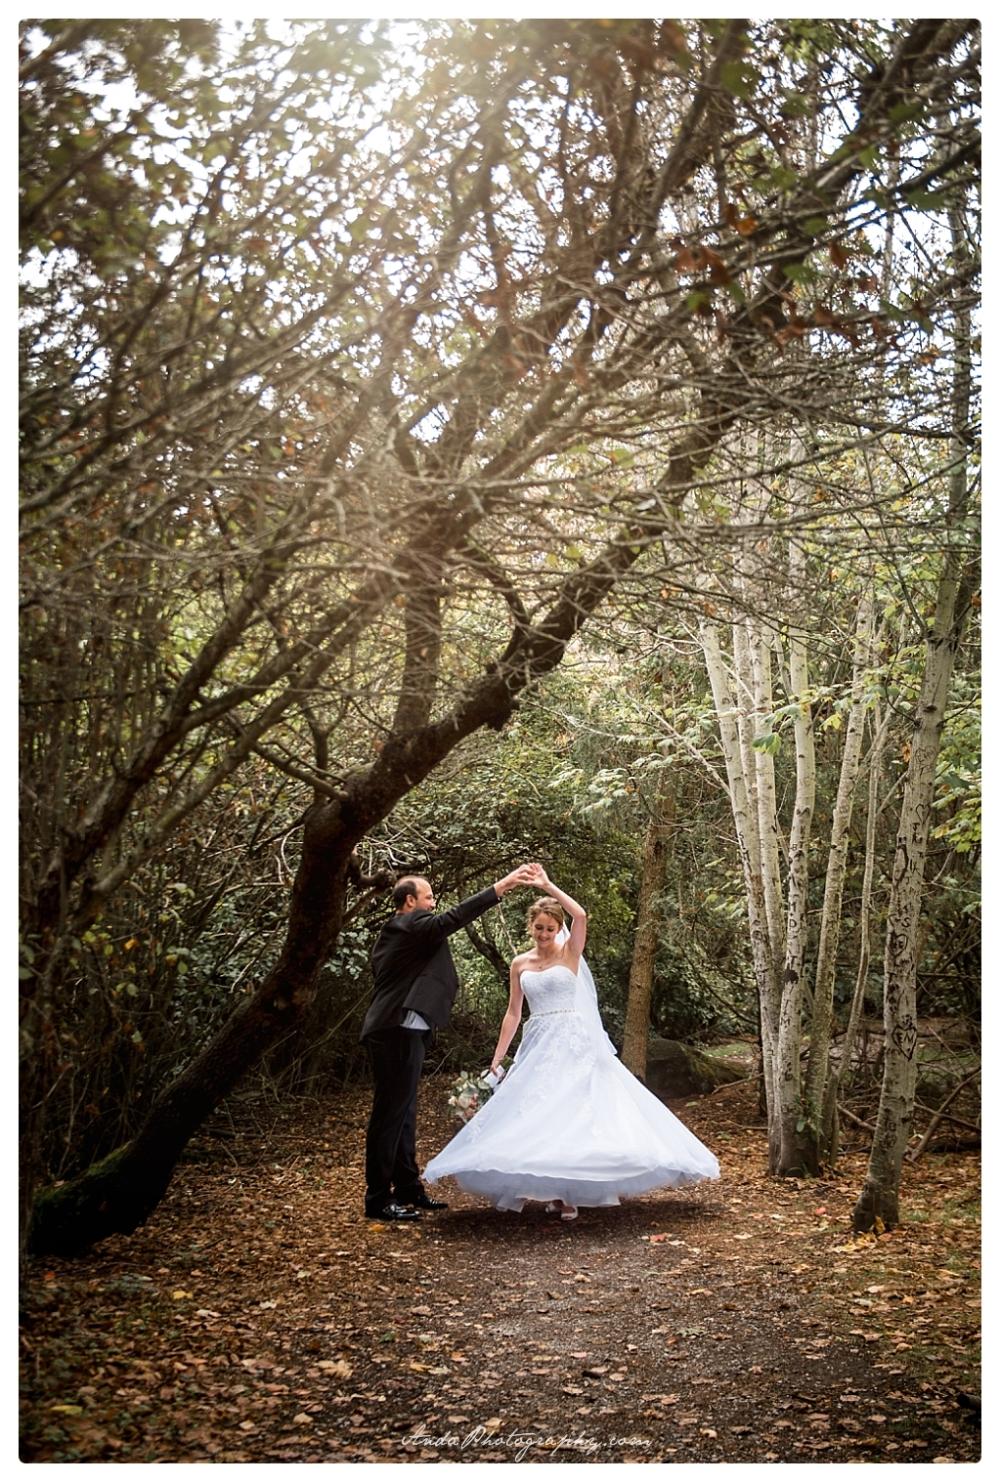 Anda Photography Bellingham wedding photographer Bellingham Yacht Club Wedding lifestyle wedding photographer Seattle Wedding Photographer_0057